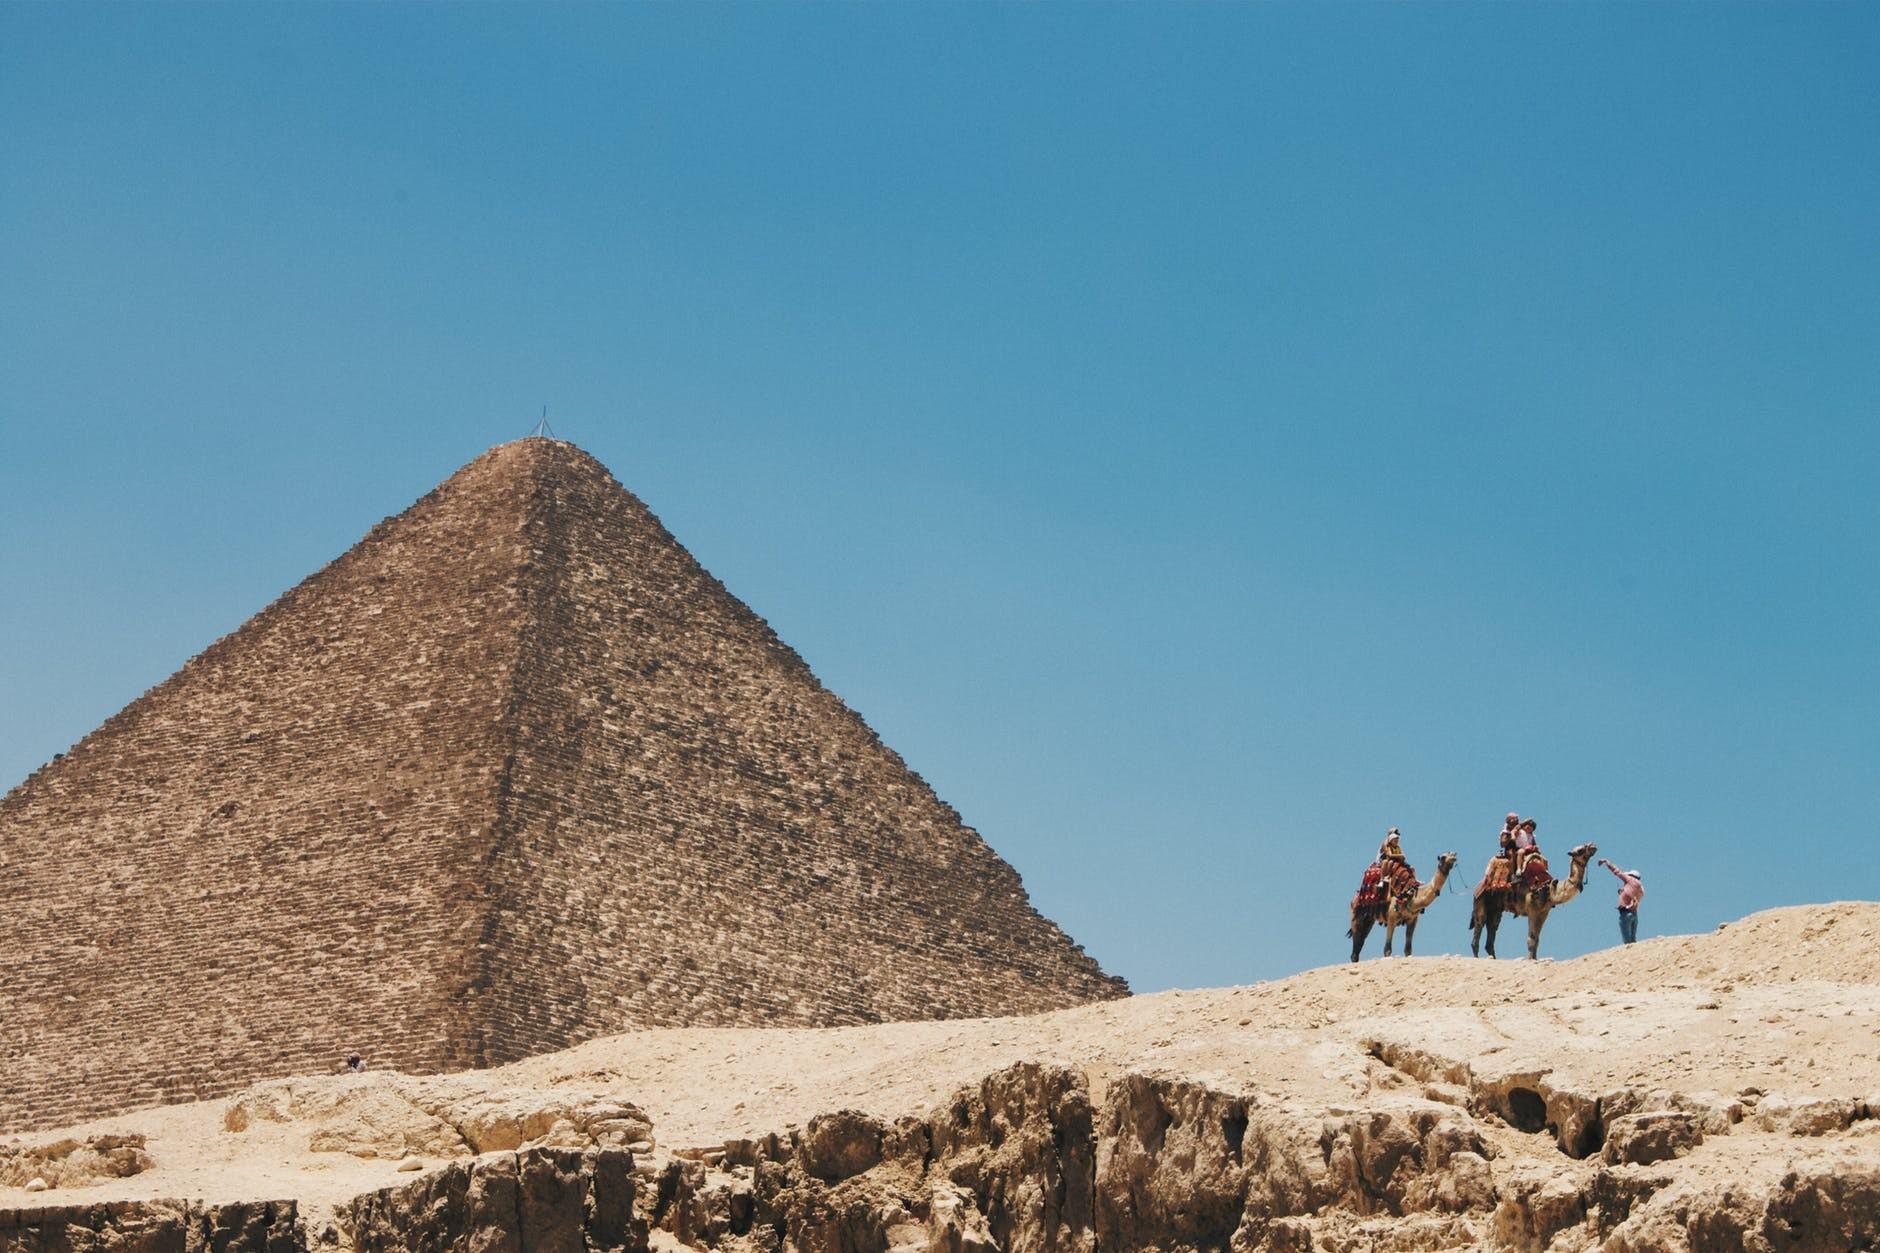 Day tour to Giza Pyramids,Sphinx, Memphis ,Saqqara Step Pyramid, Tombs of Nobles and Dahshour Red &Bent Pyramids